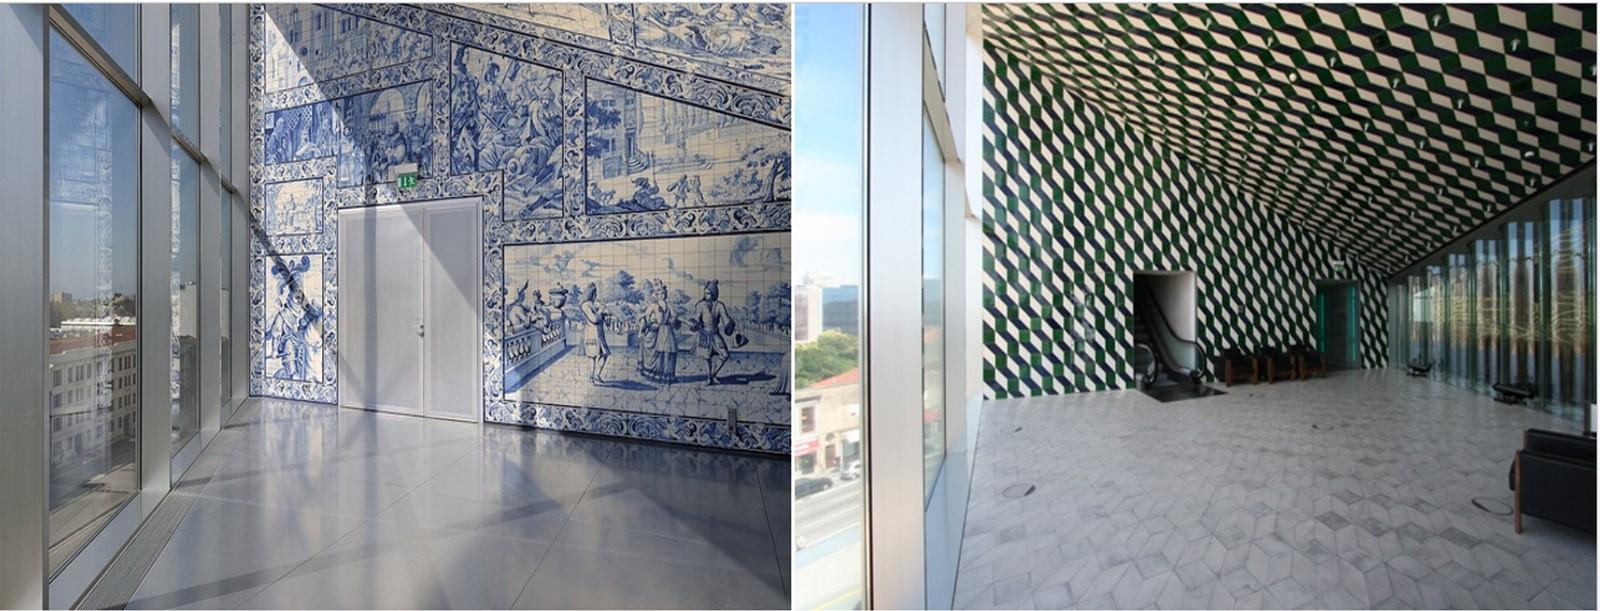 Casa Da Musica, Porto by Rem Koolhaas: The Asymmetrical Polyhedron - Sheet9